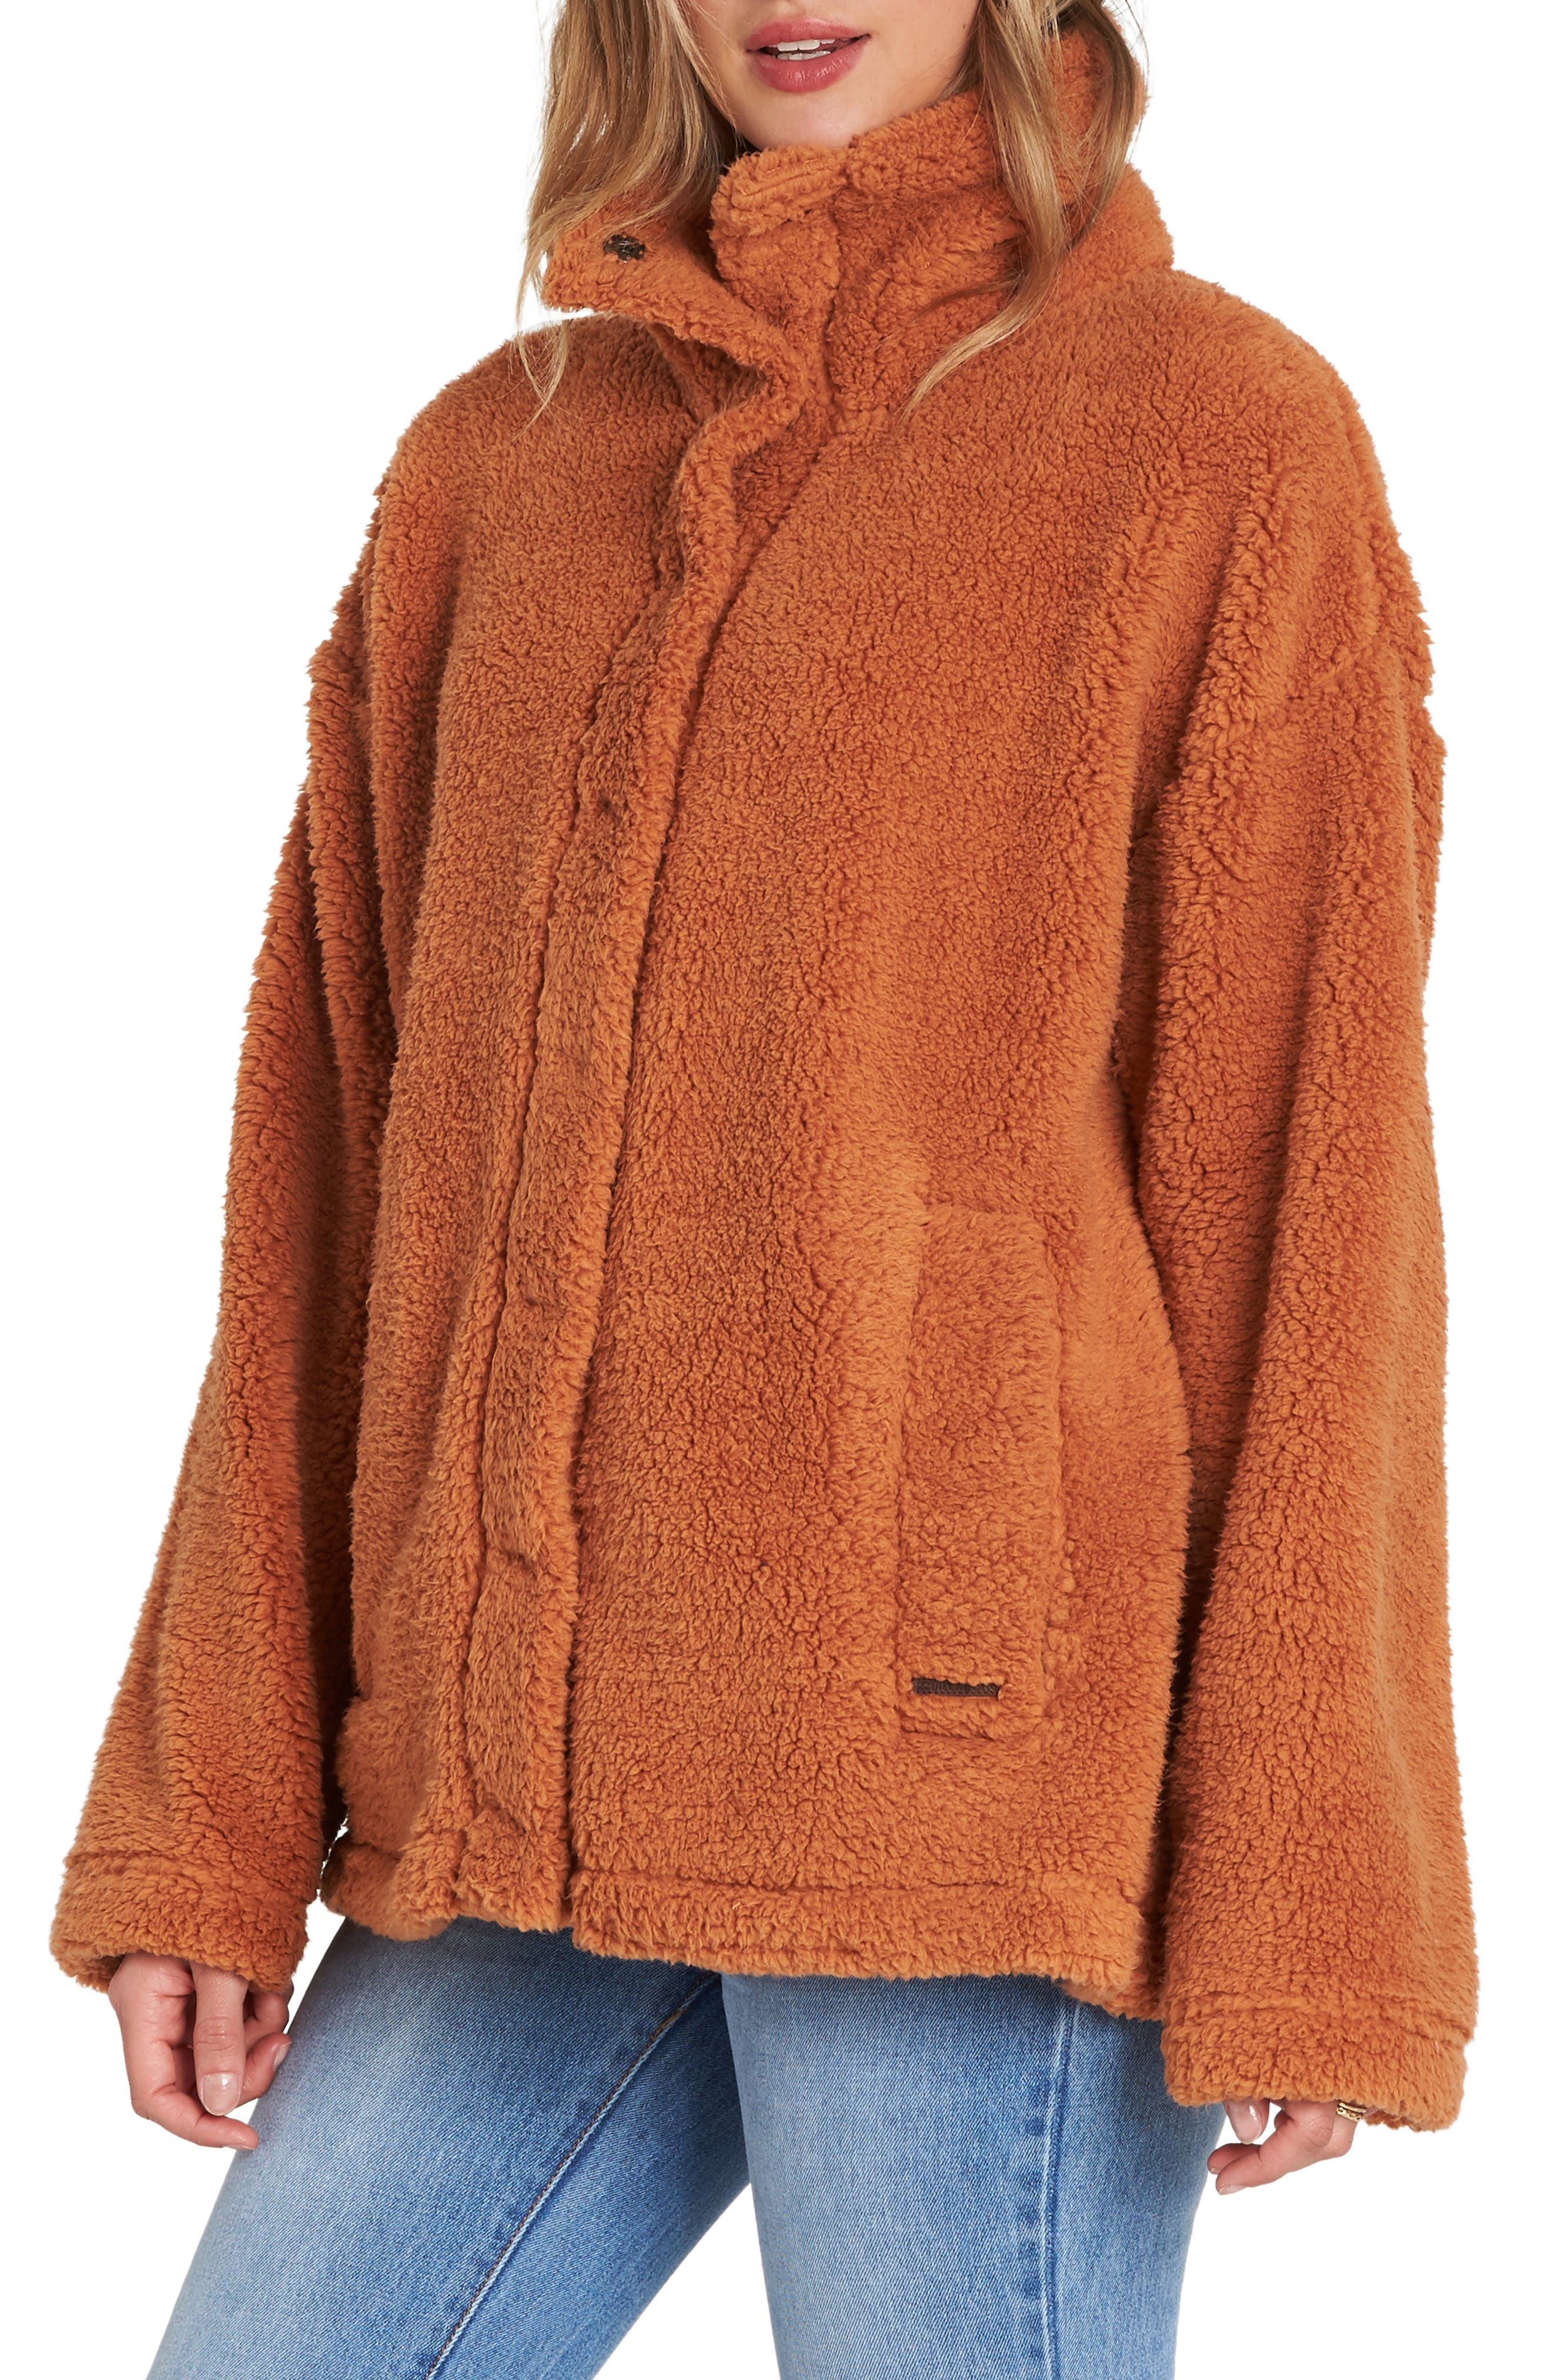 BILLABONG, Cozy Days Faux Fur Jacket, Alternate thumbnail 3, color, TOFFEE